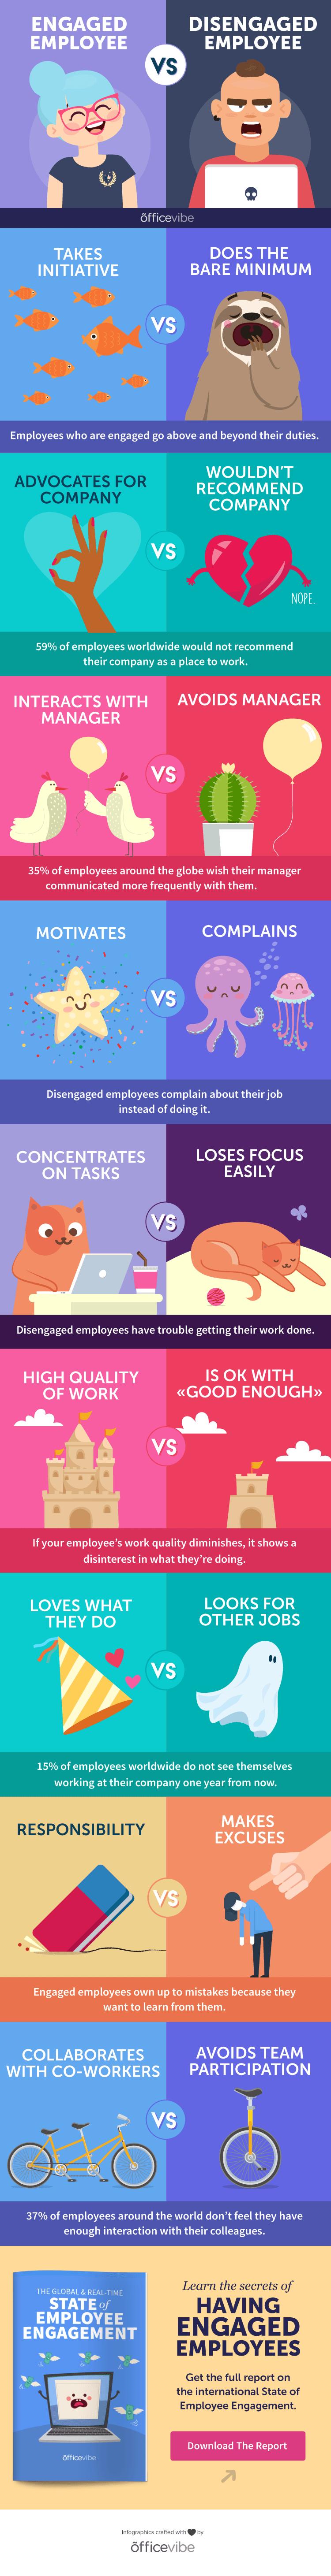 disengaged employee infographic